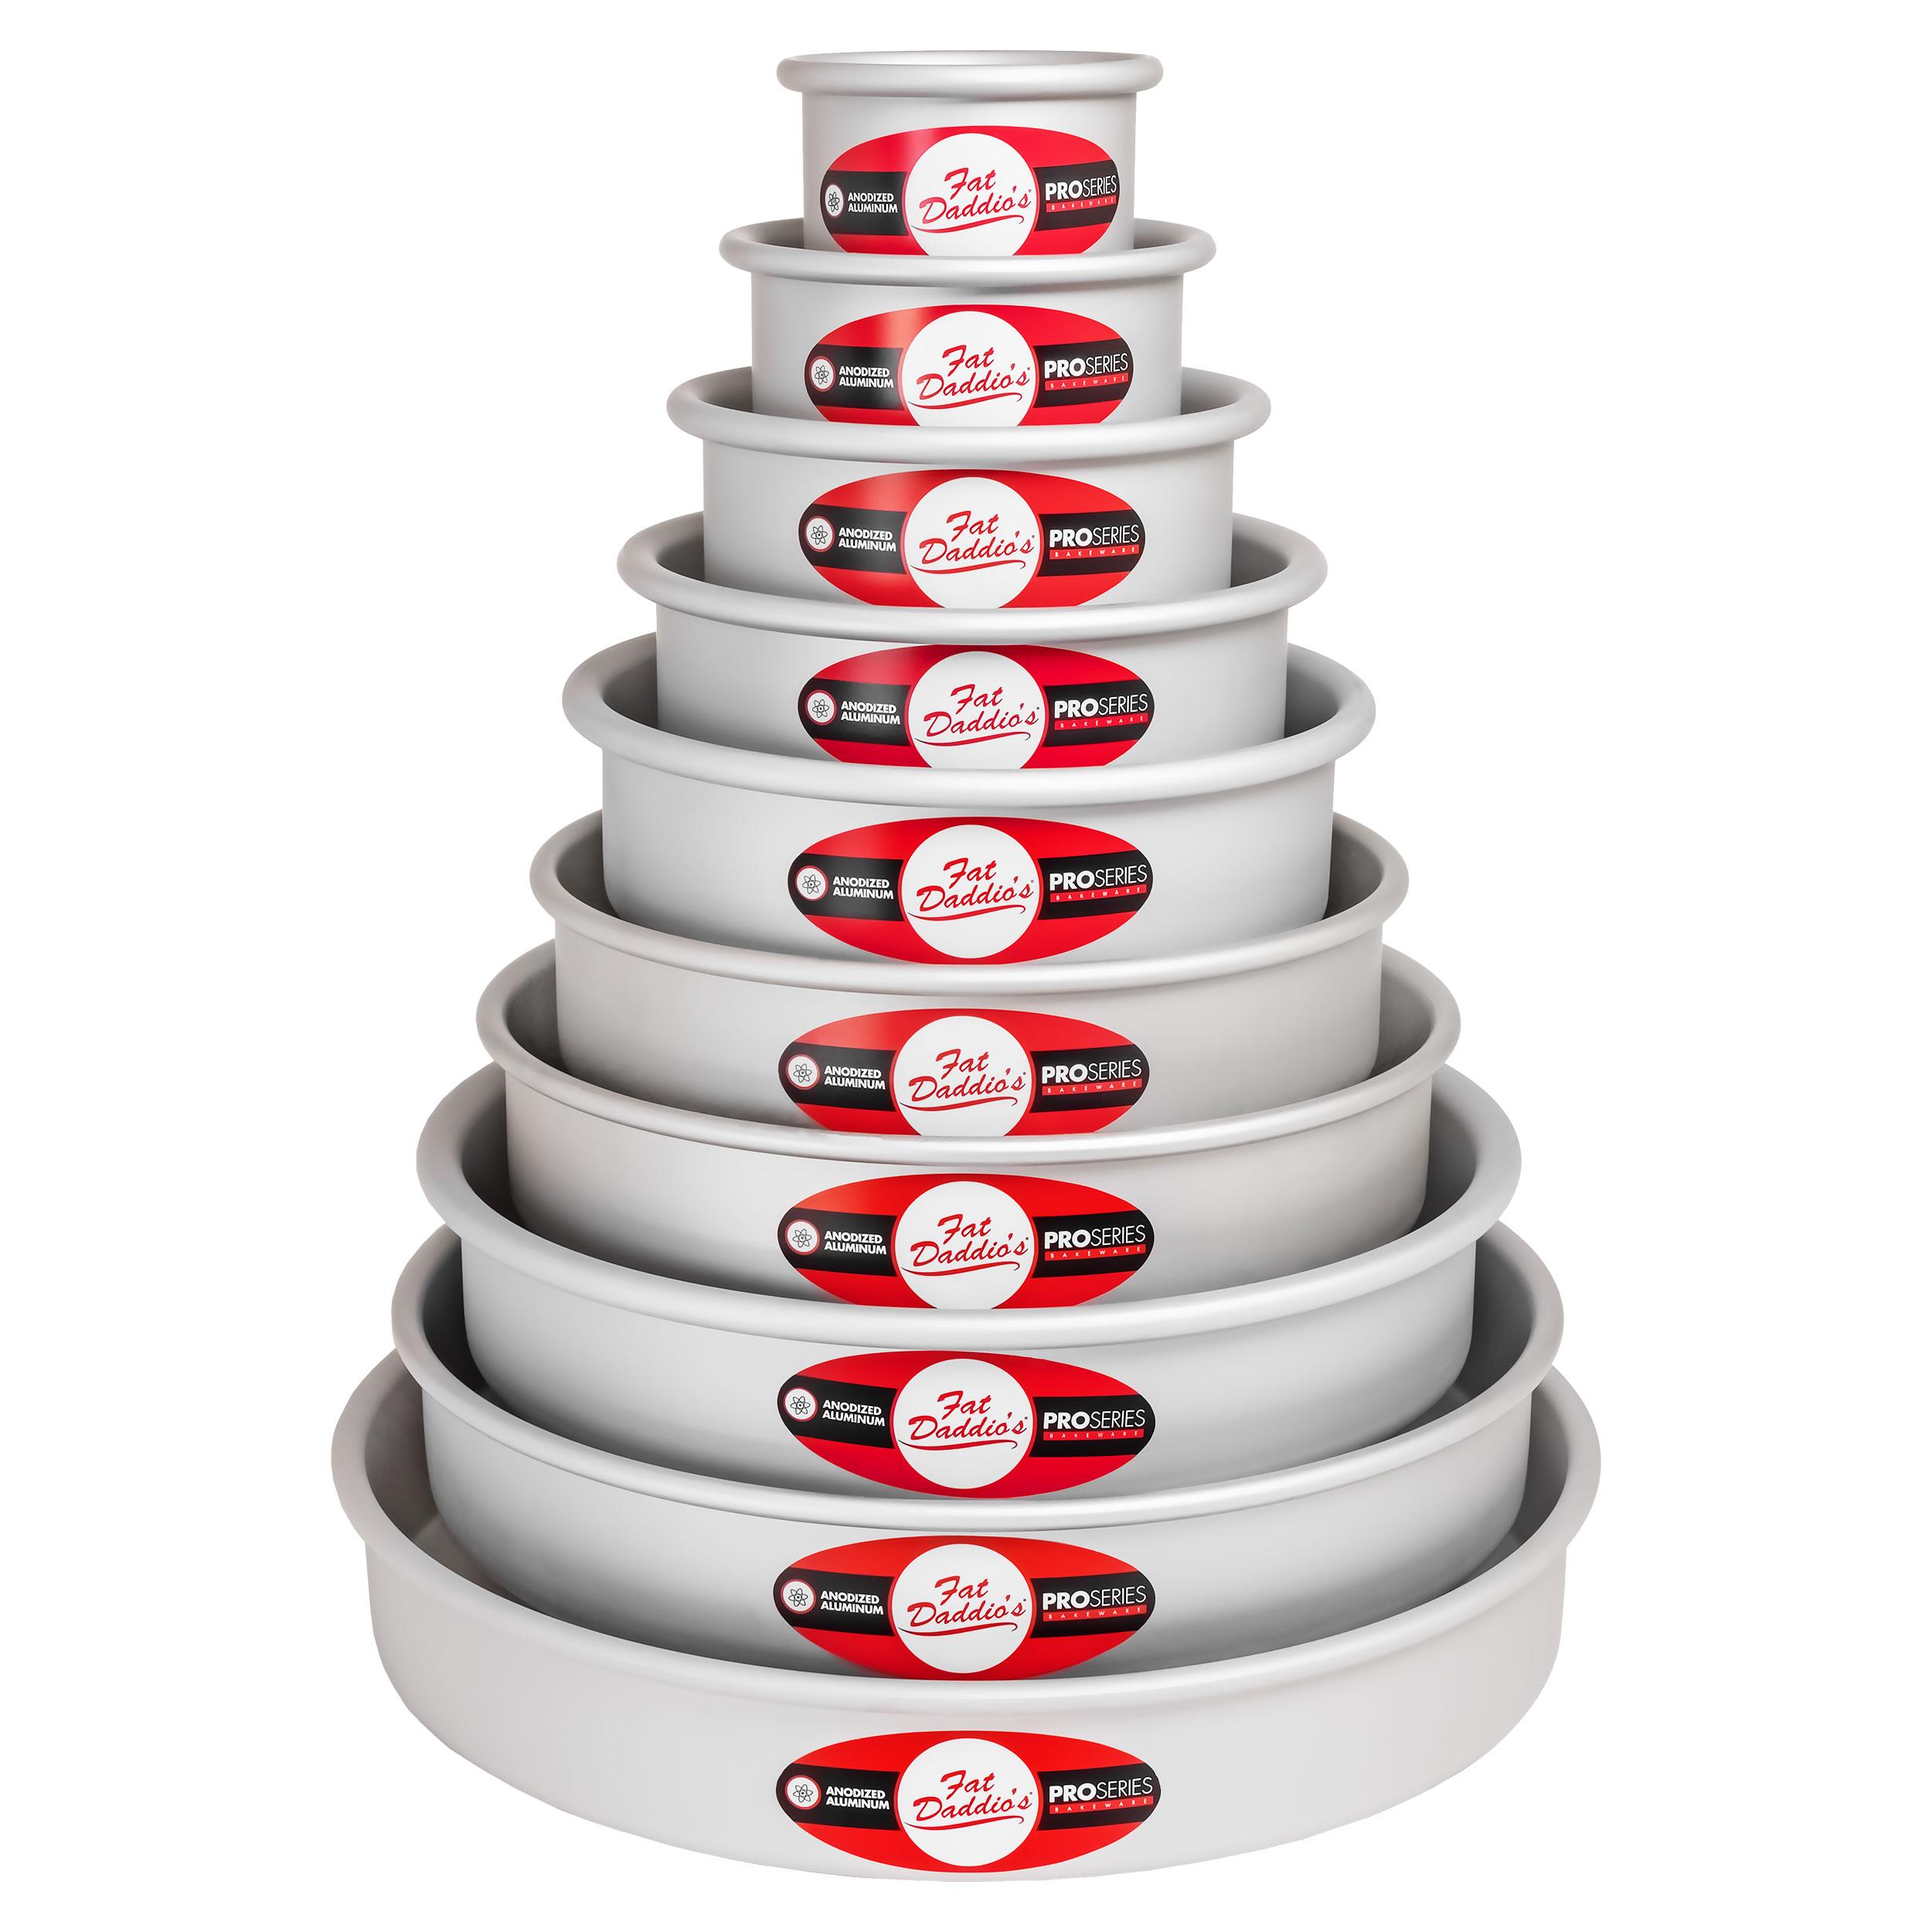 Fat Daddio's Round Cake Pan Tower